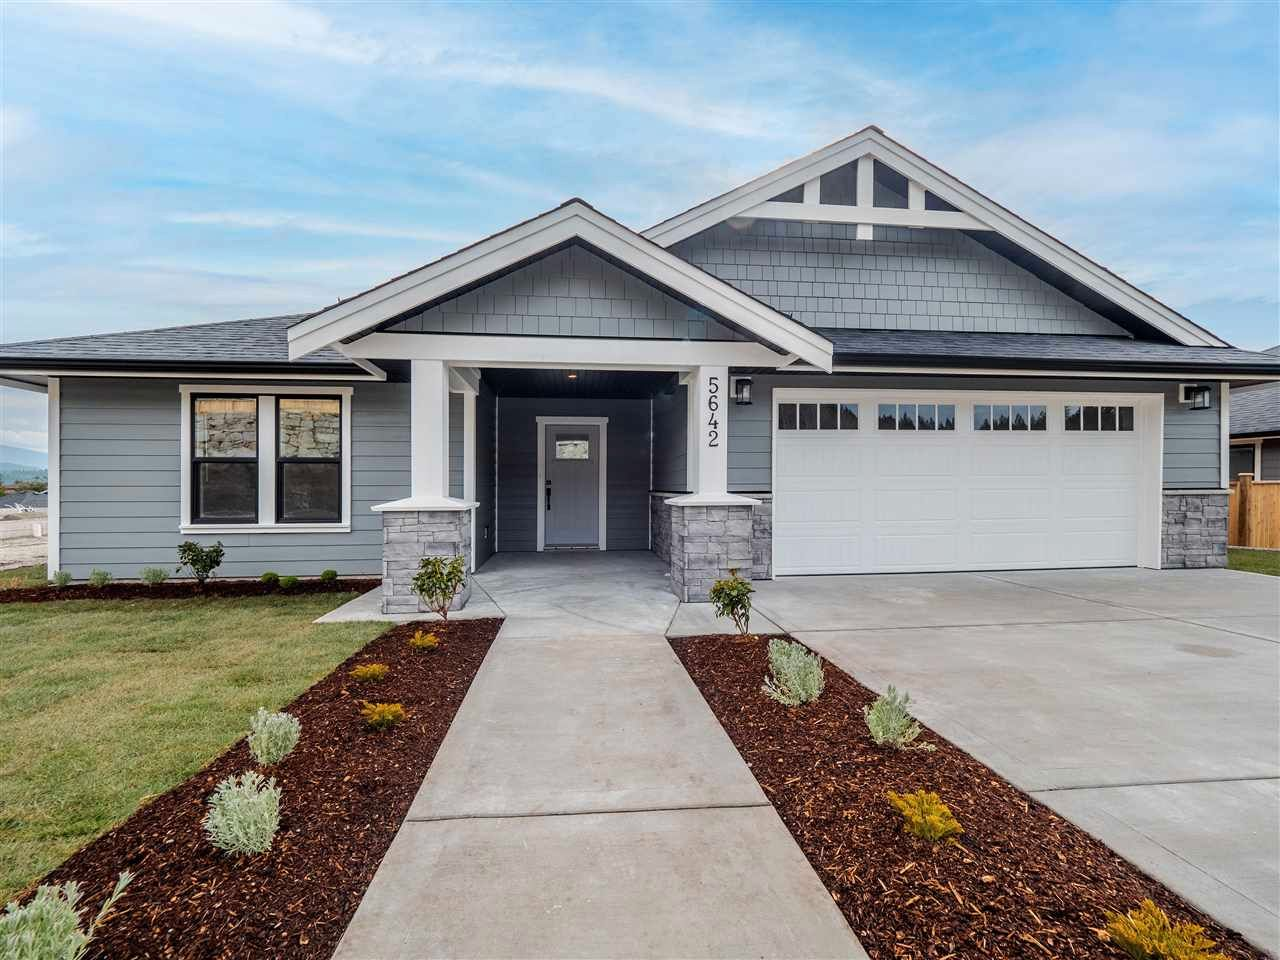 Main Photo: 5672 DERBY Road in Sechelt: Sechelt District House for sale (Sunshine Coast)  : MLS®# R2576594